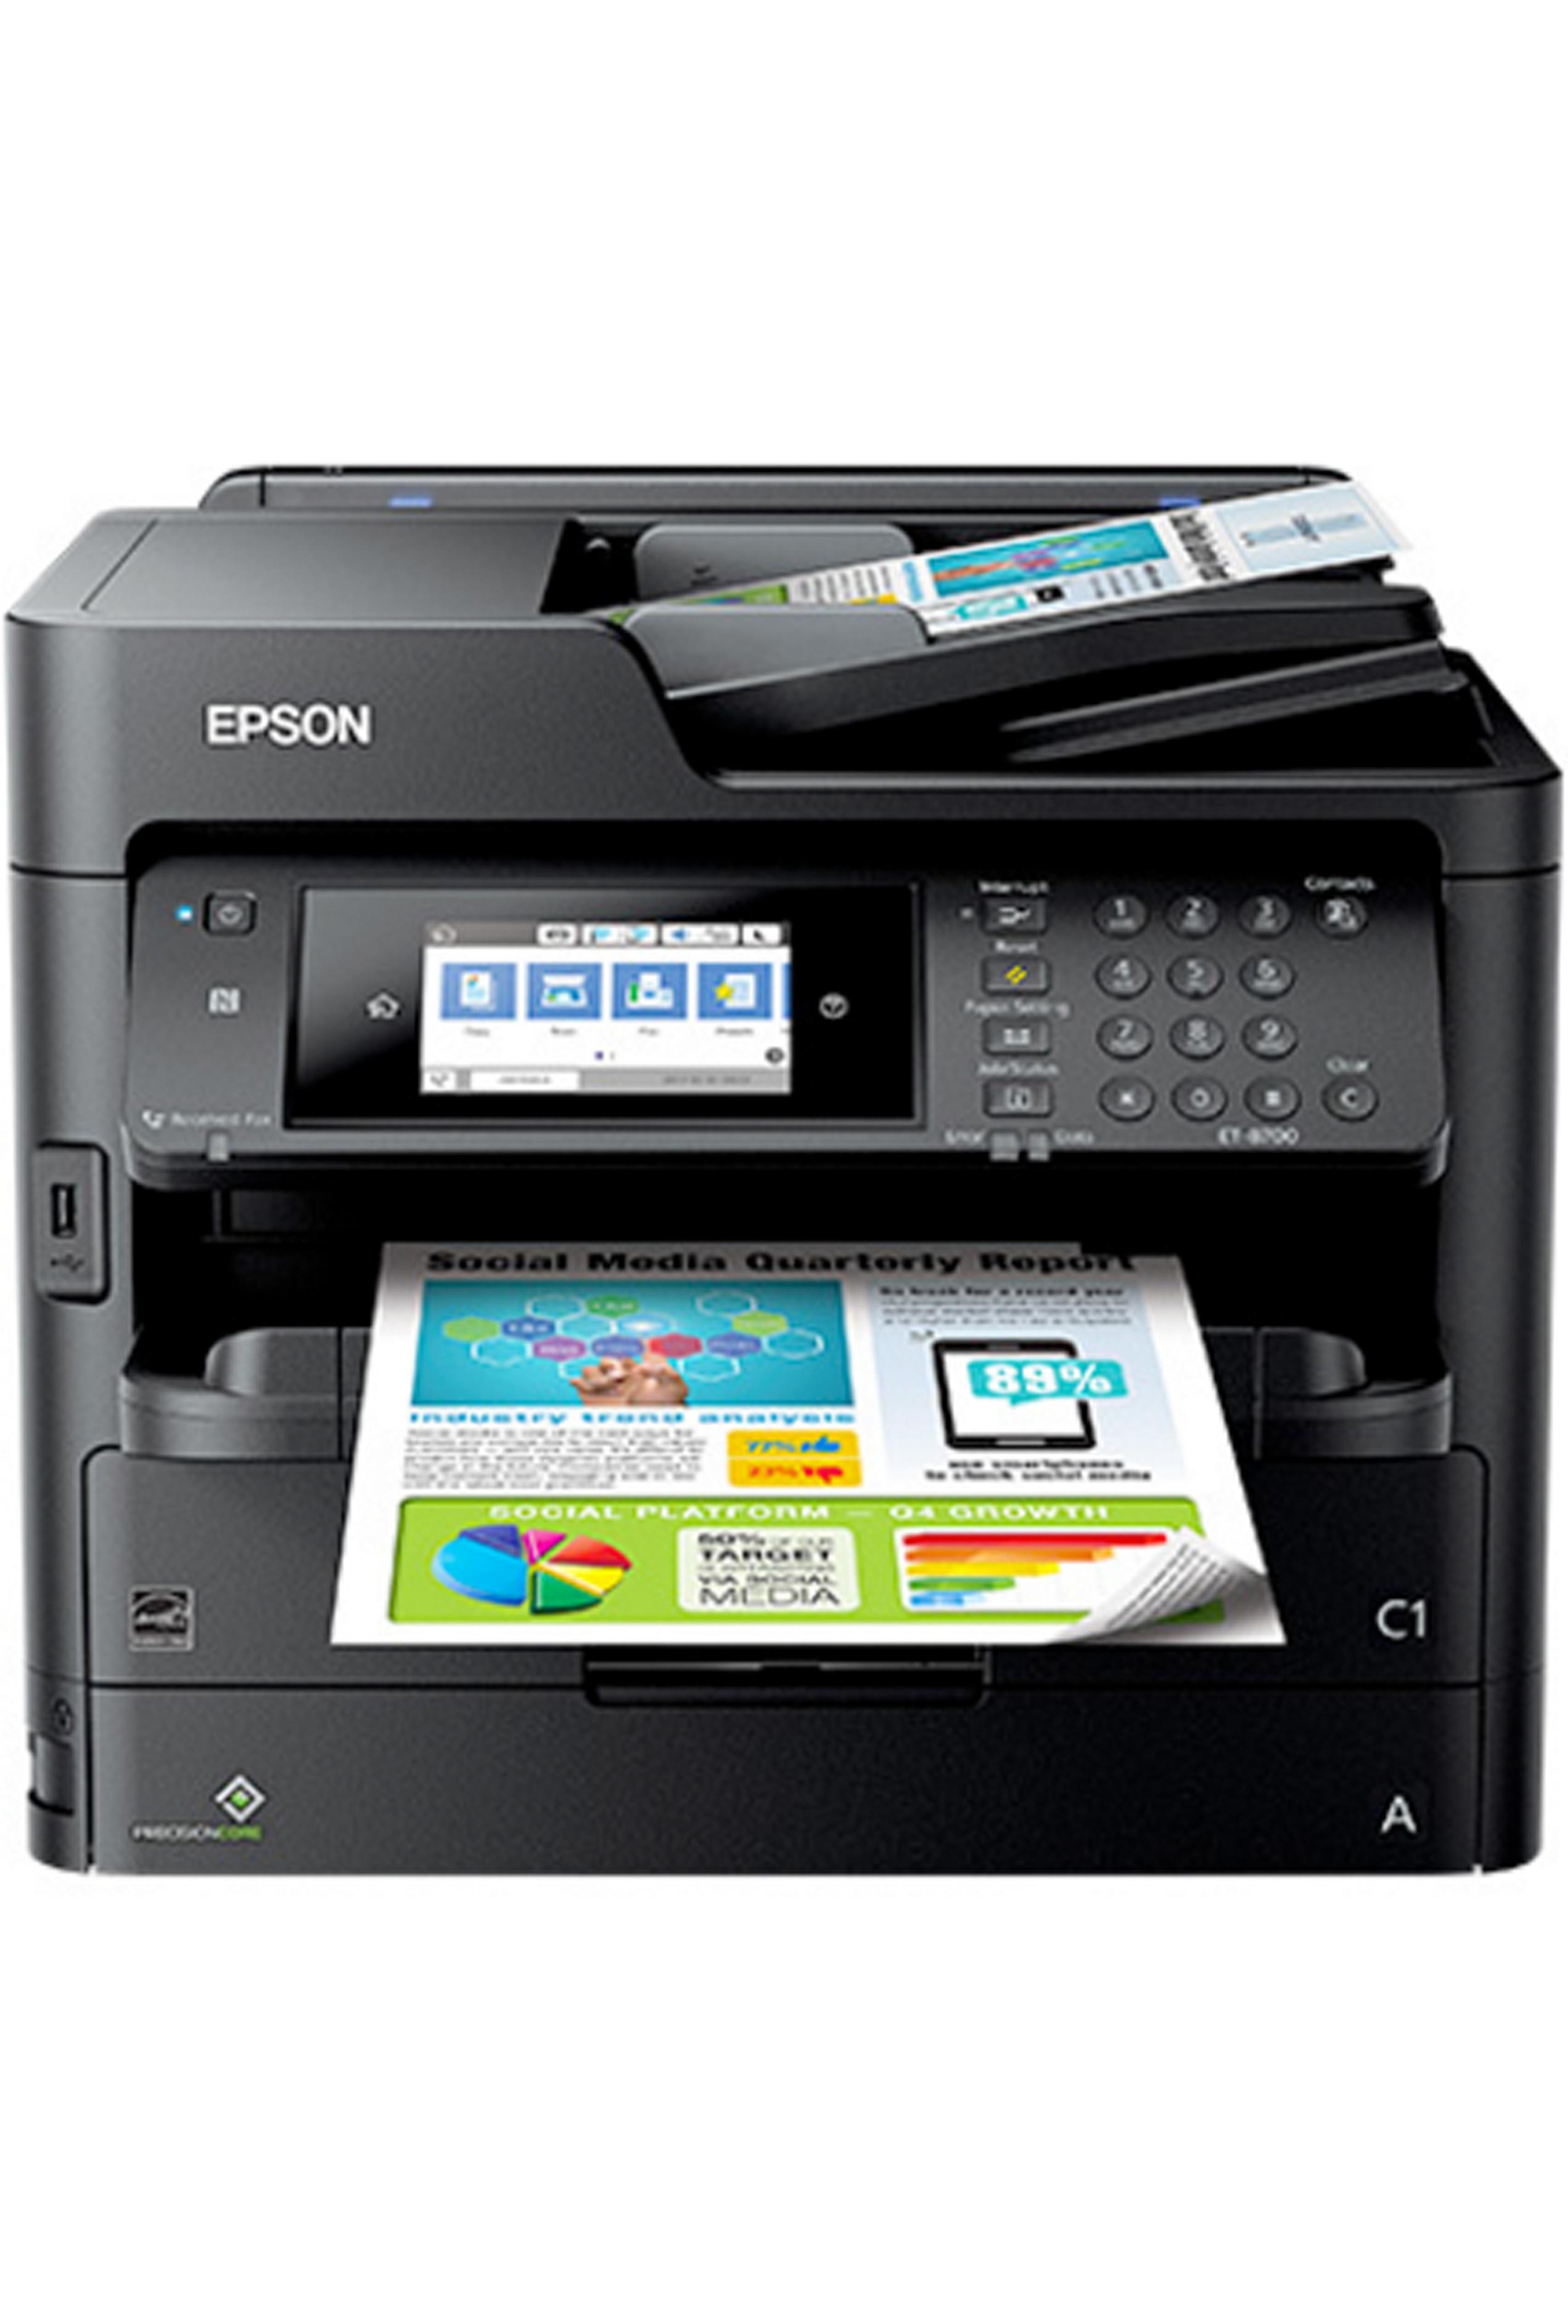 Epson Et 8700 Printer Driver : epson, printer, driver, WorkForce, ET-8700, EcoTank, All-in-One, Supertank, Printer, (24/24ppm)